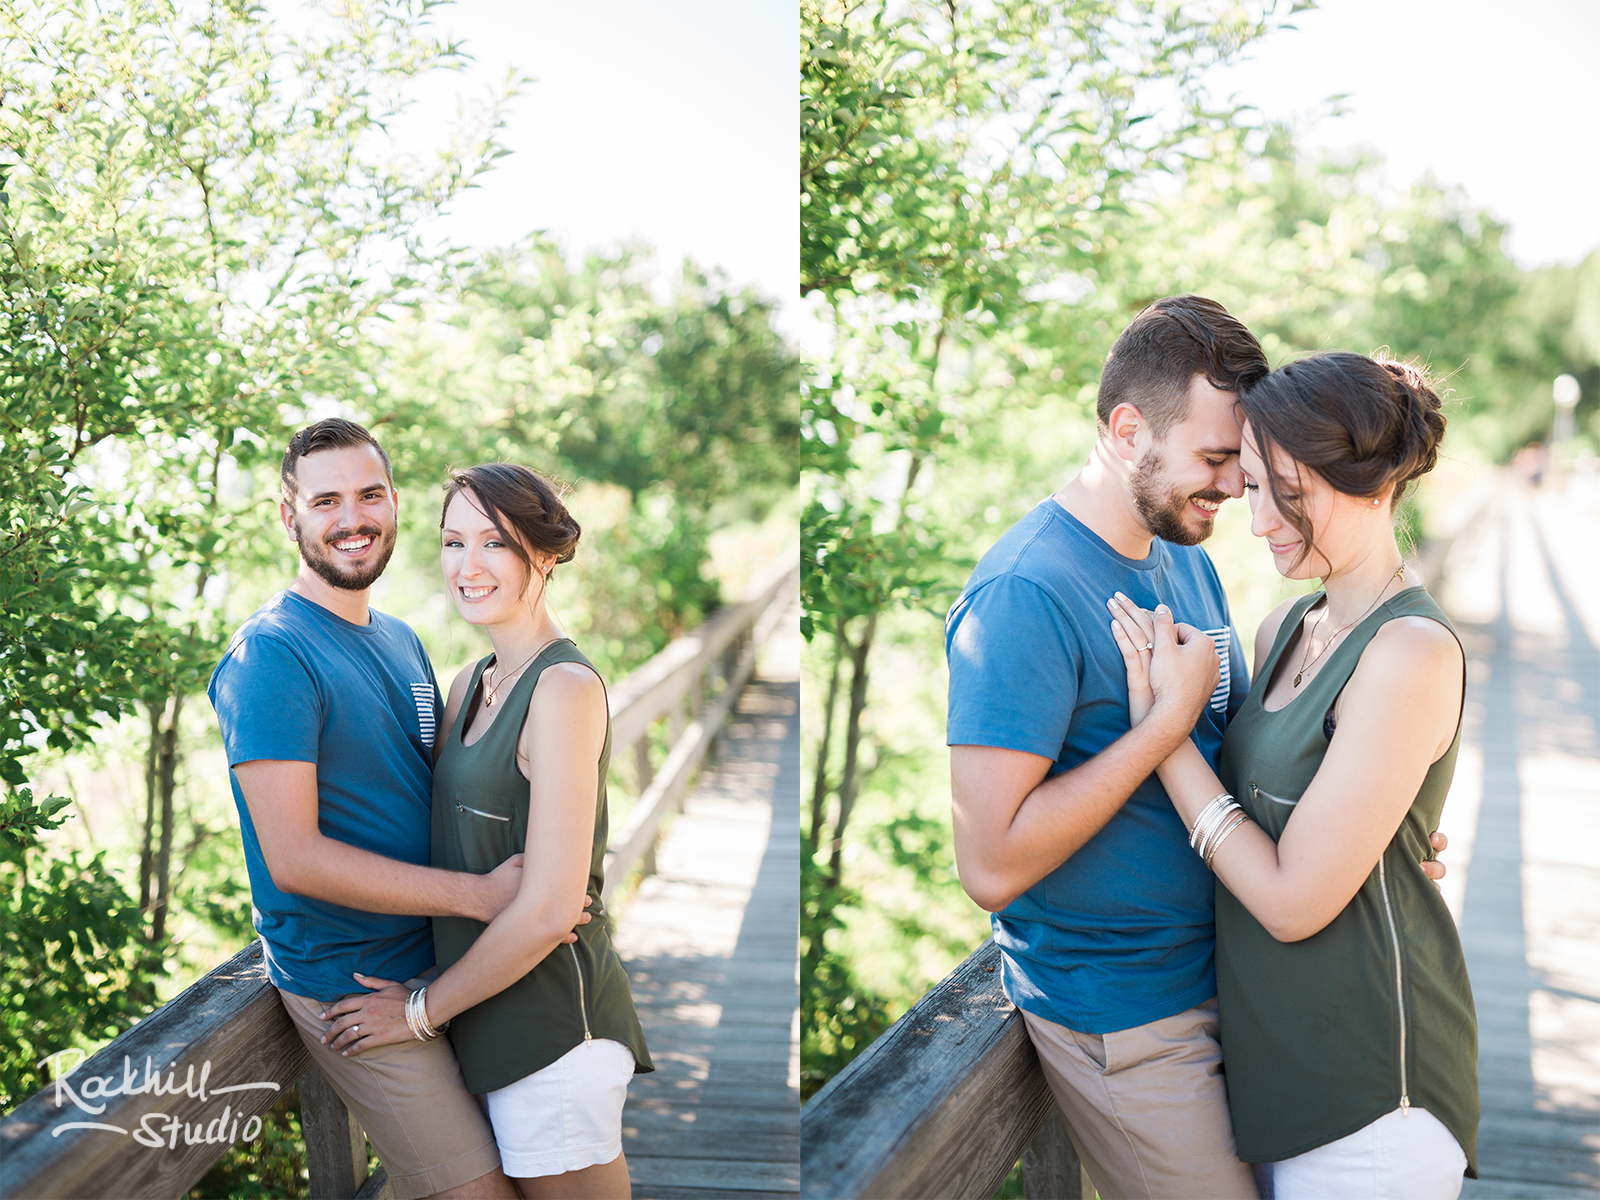 mackinac-island-wedding-engagement-northern-michigan-rockhill-studio-jt-7.jpg